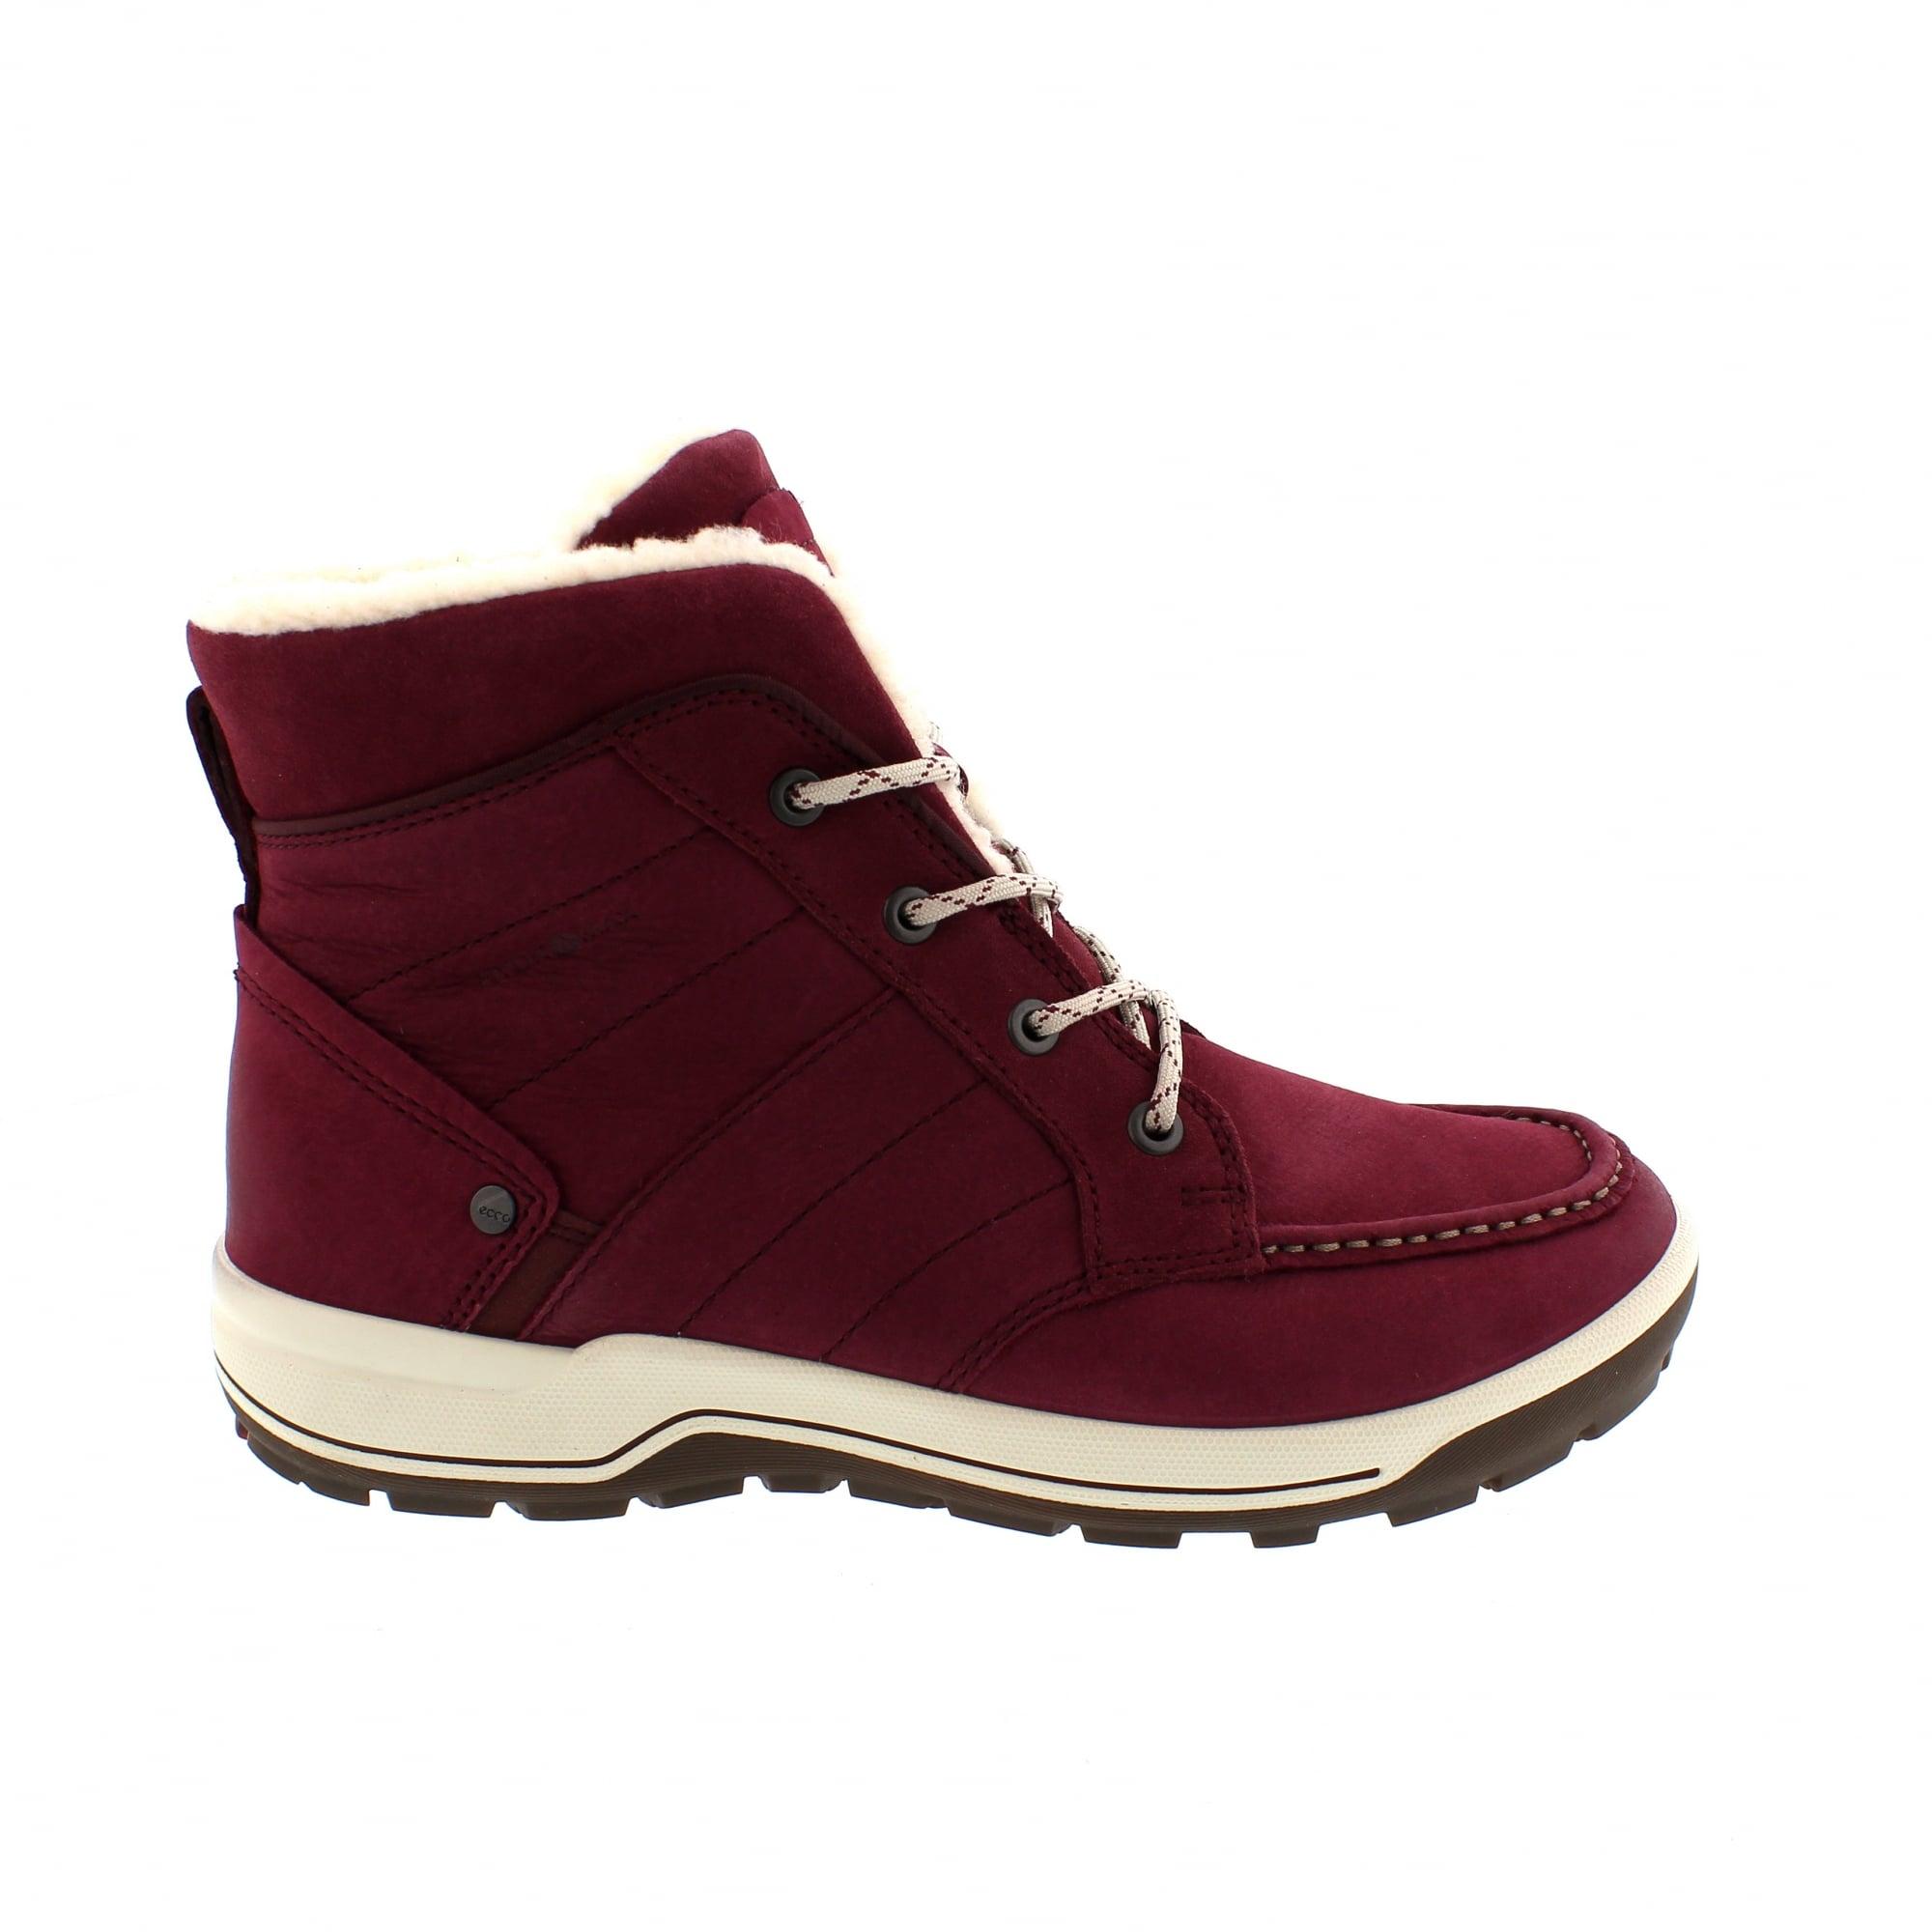 ecco free shipping shoes, Women Boots ecco TRACE LITE